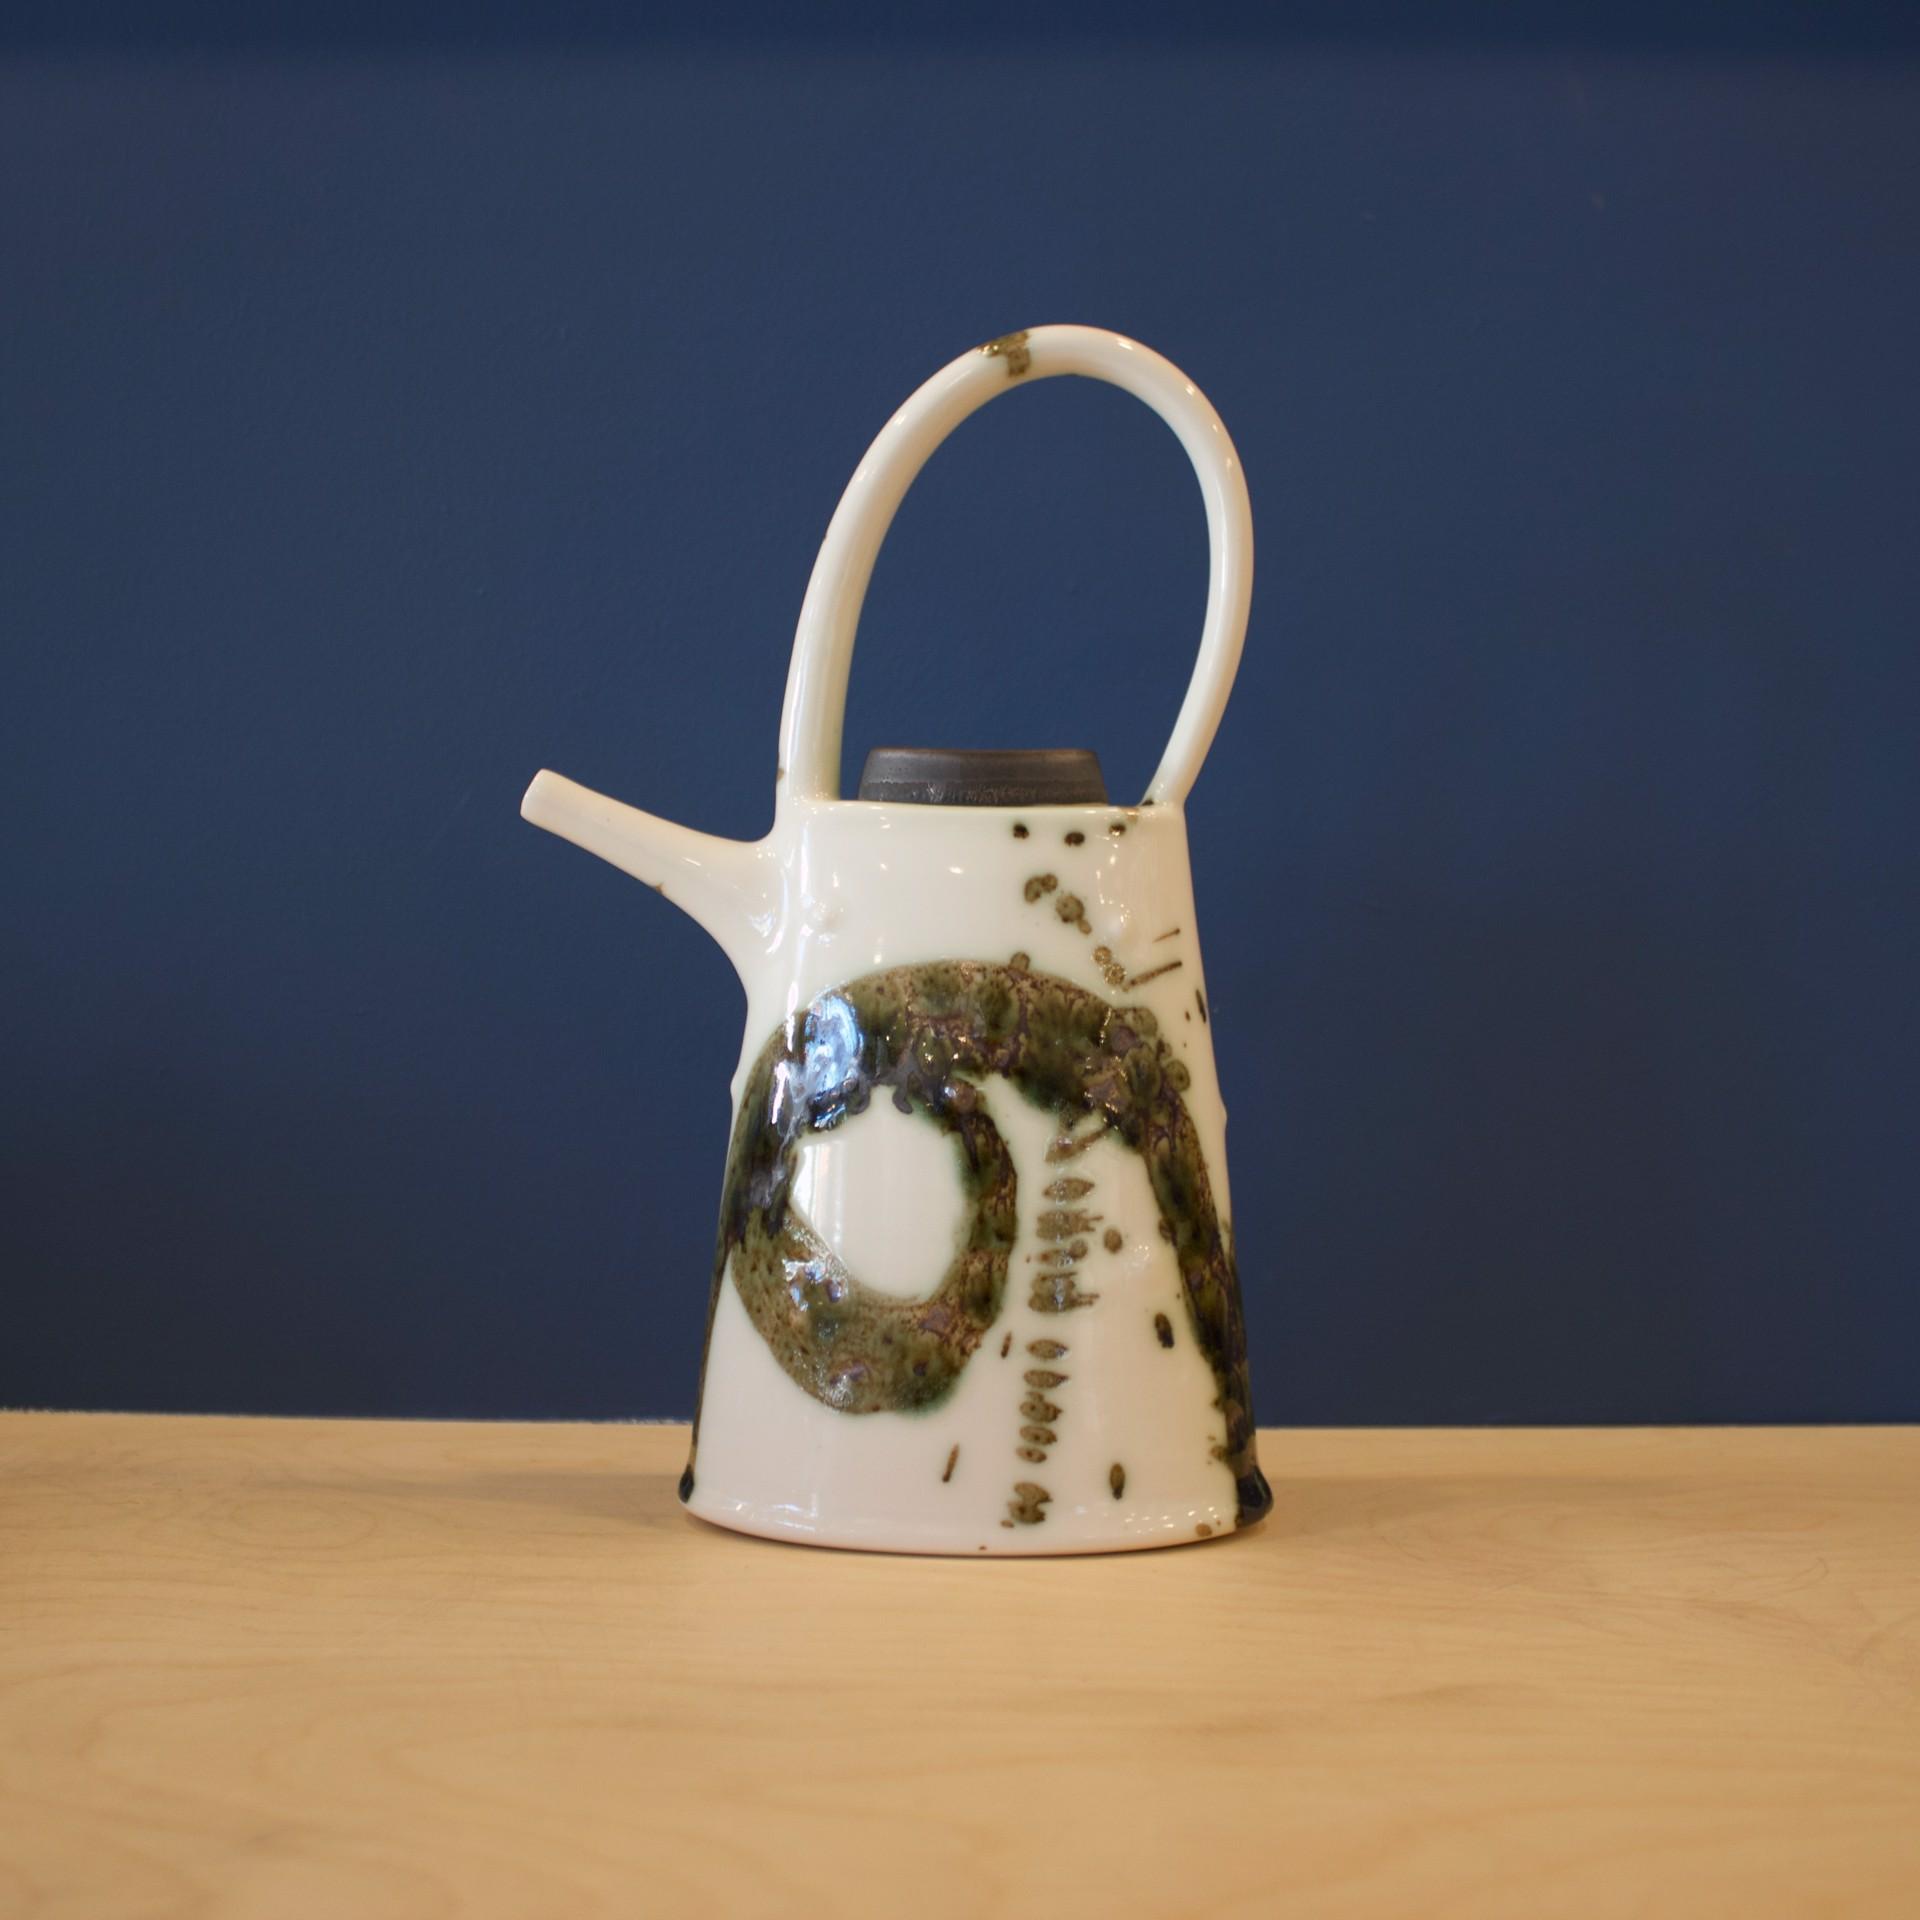 Splash Oval Teapot by Patricia Thom